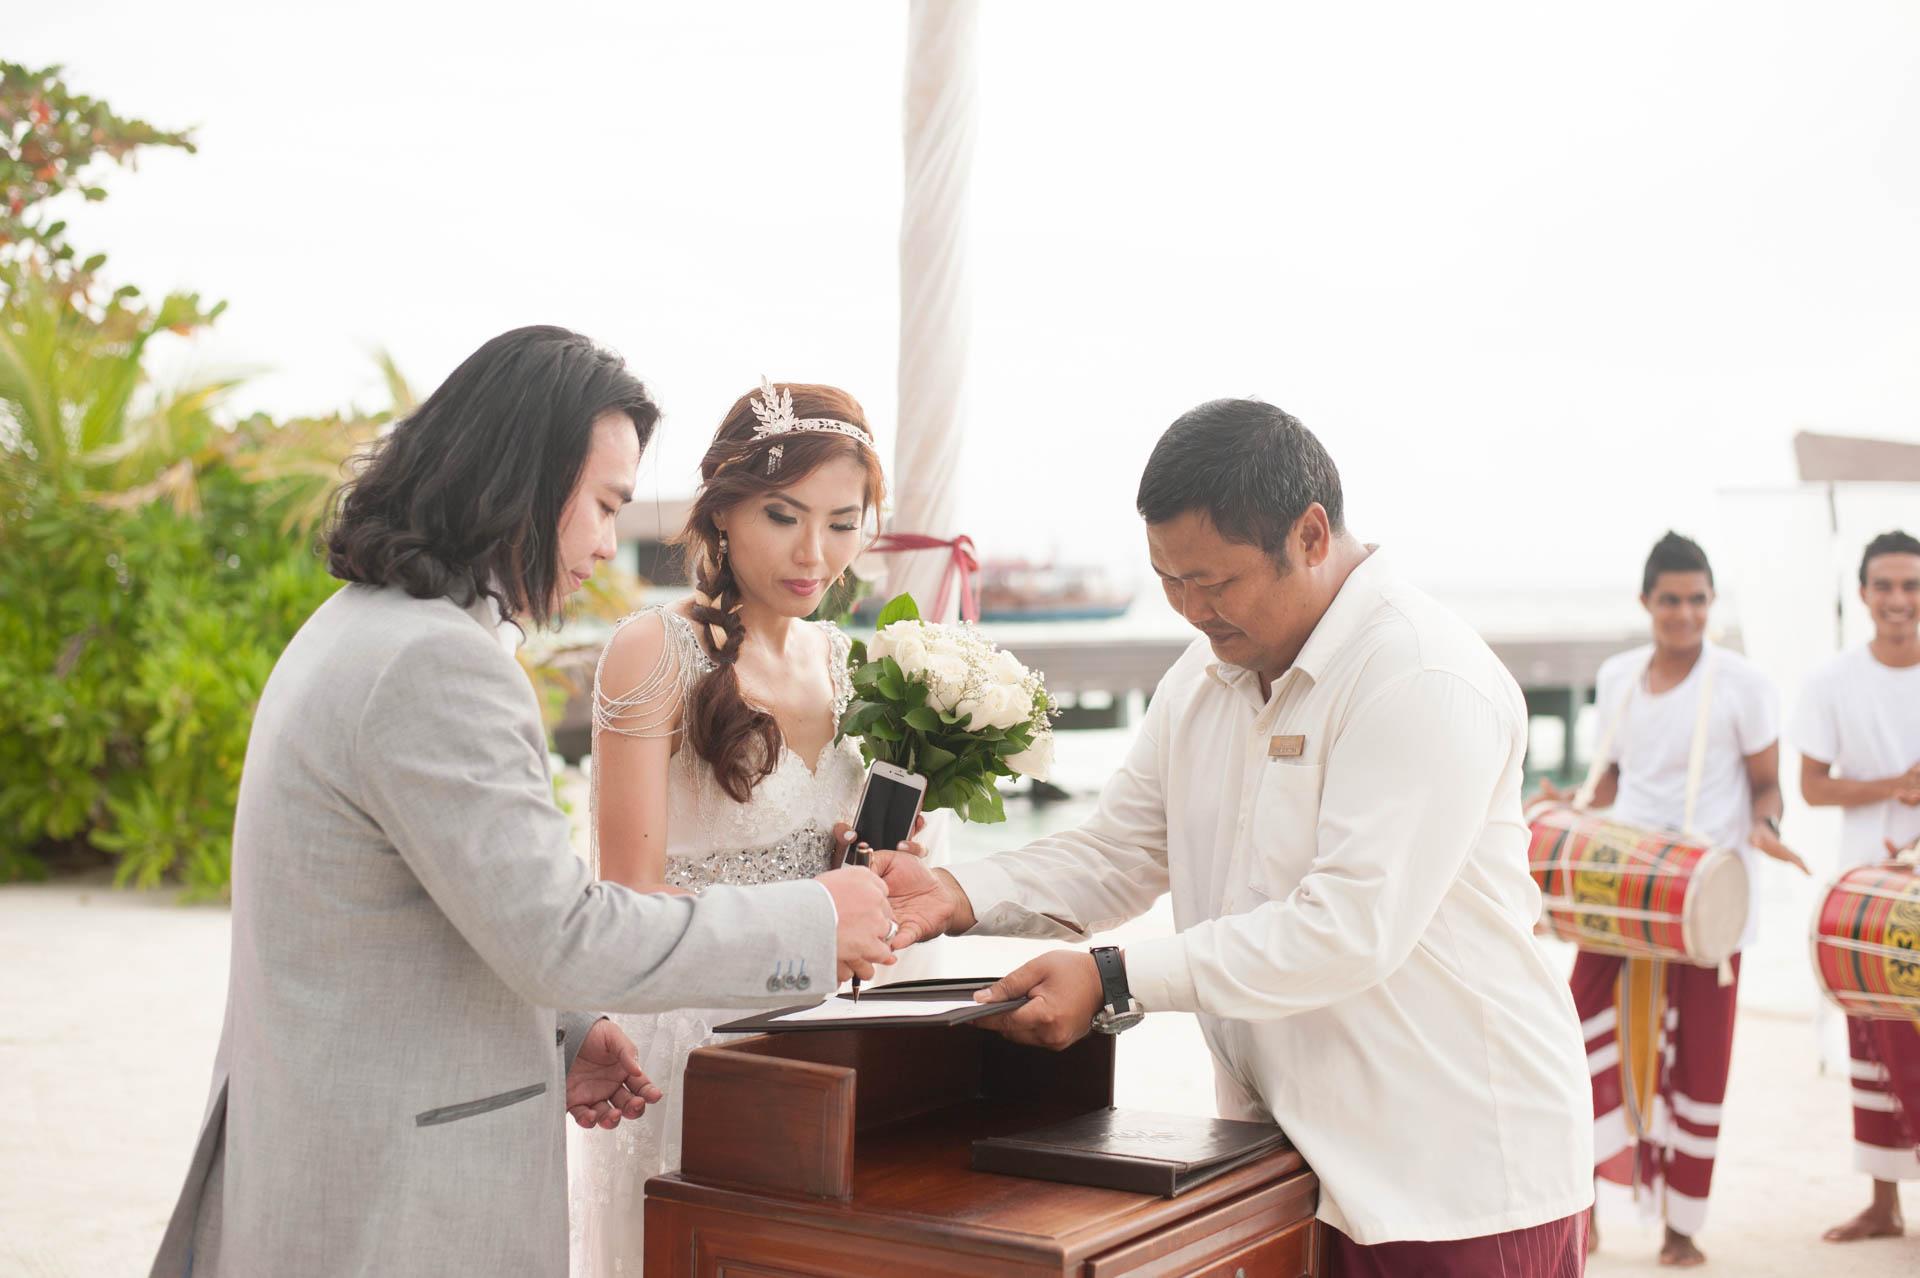 Chih Chao Yu Shan Destination Wedding at Residence Maldives 27